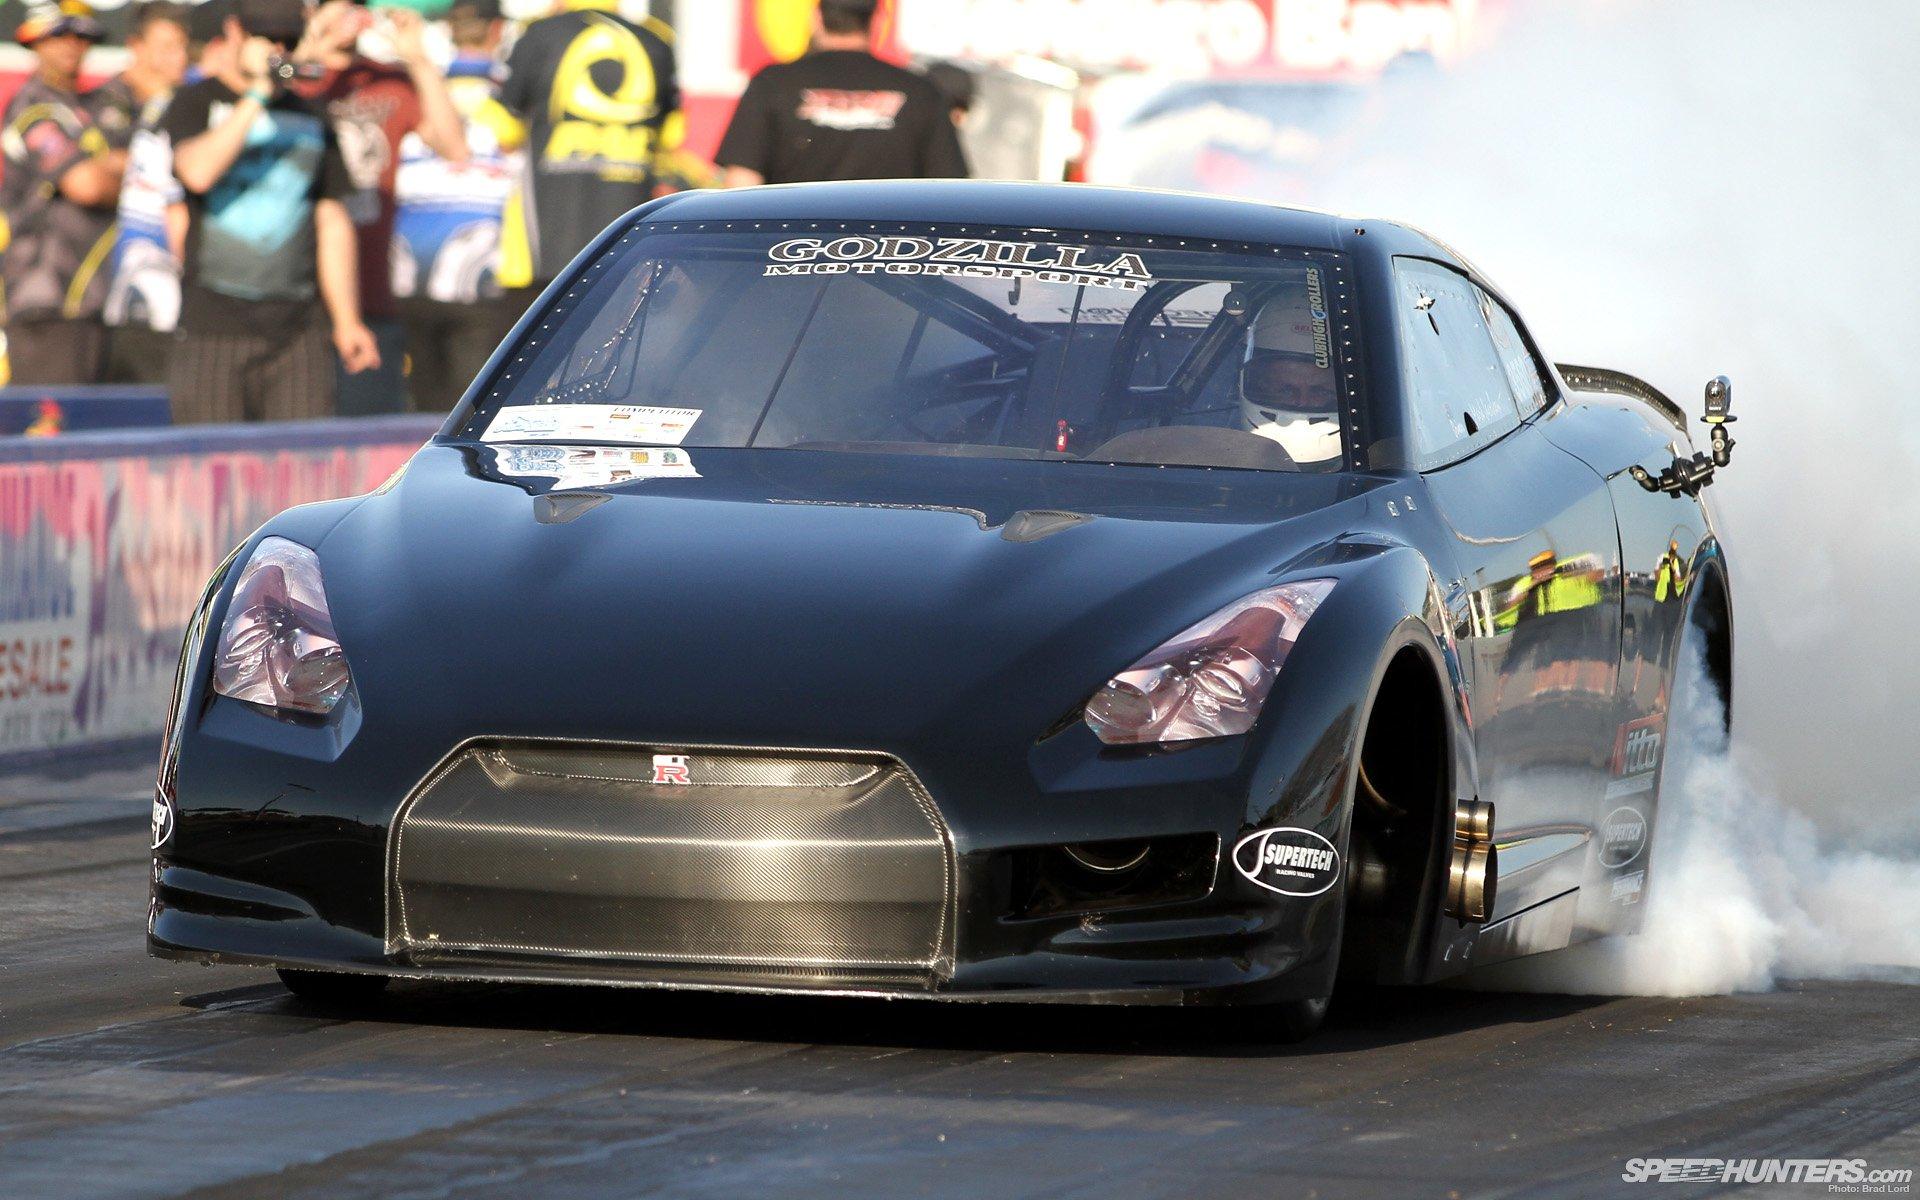 Gtr Alpha 12 >> Drag Racing HD Wallpaper | Background Image | 1920x1200 ...